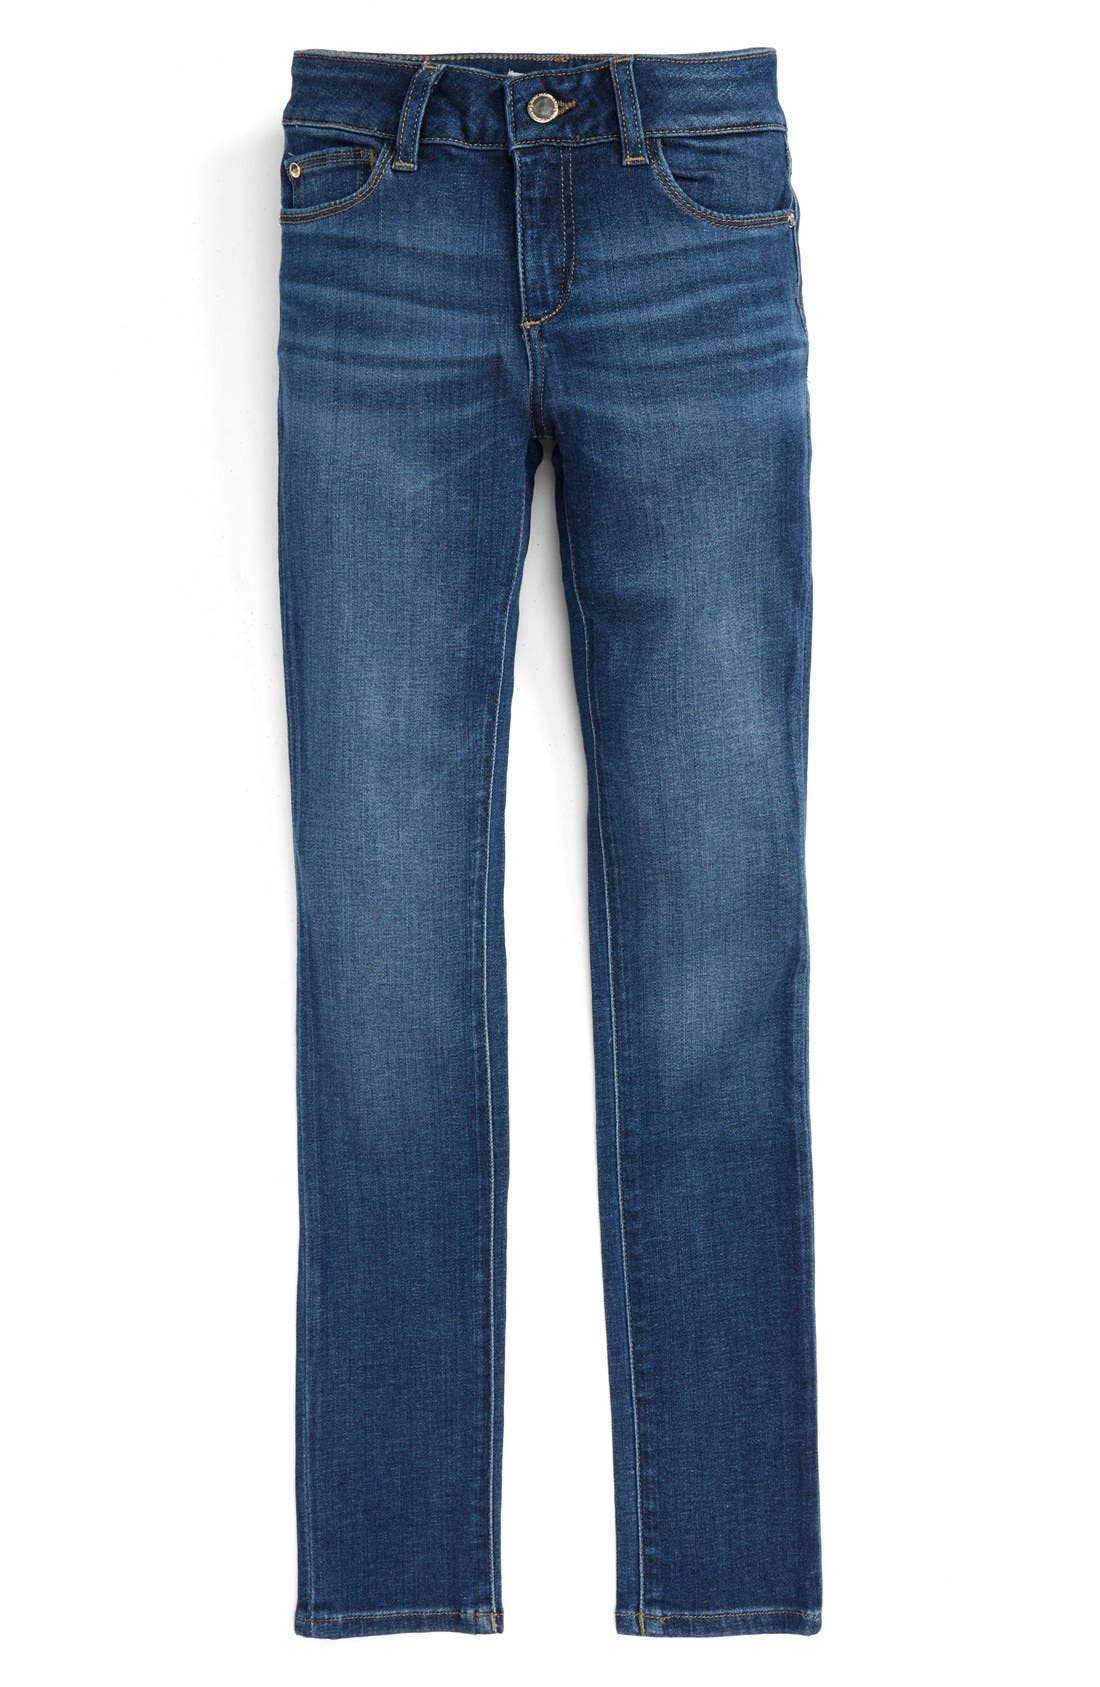 Chloe Mid Rise Skinny Jeans,                             Main thumbnail 1, color,                             PARULA